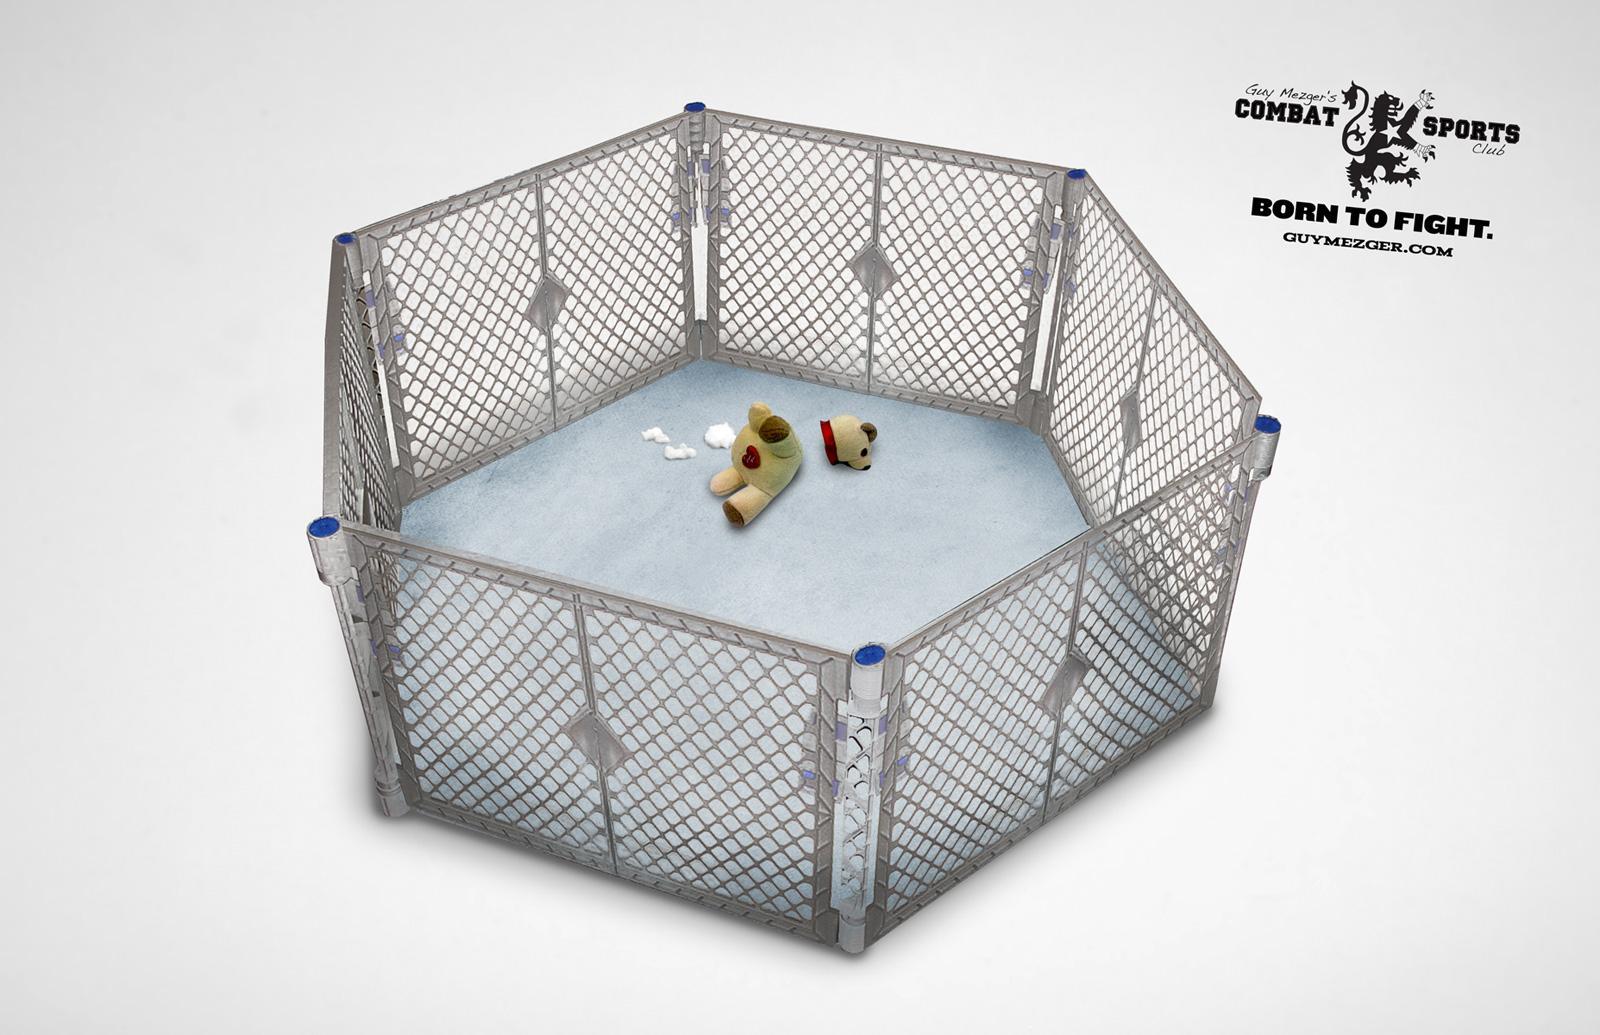 Guy Mezger Combat Sports Club Print Ad -  Cage